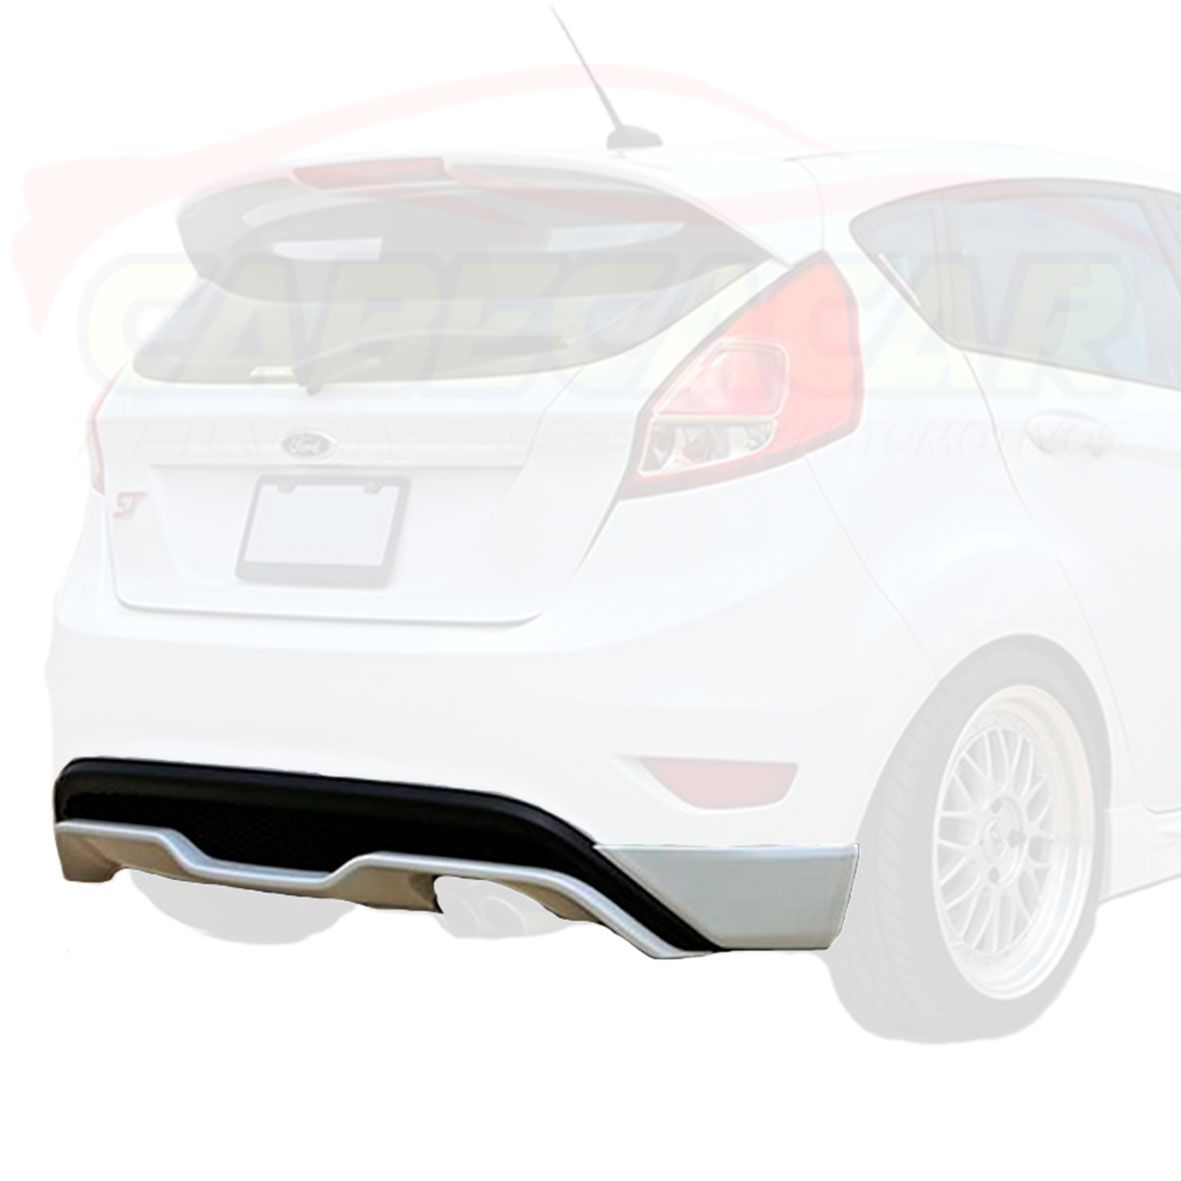 spoiler traseiro New Fiesta 13 14 15 16 17  tuning